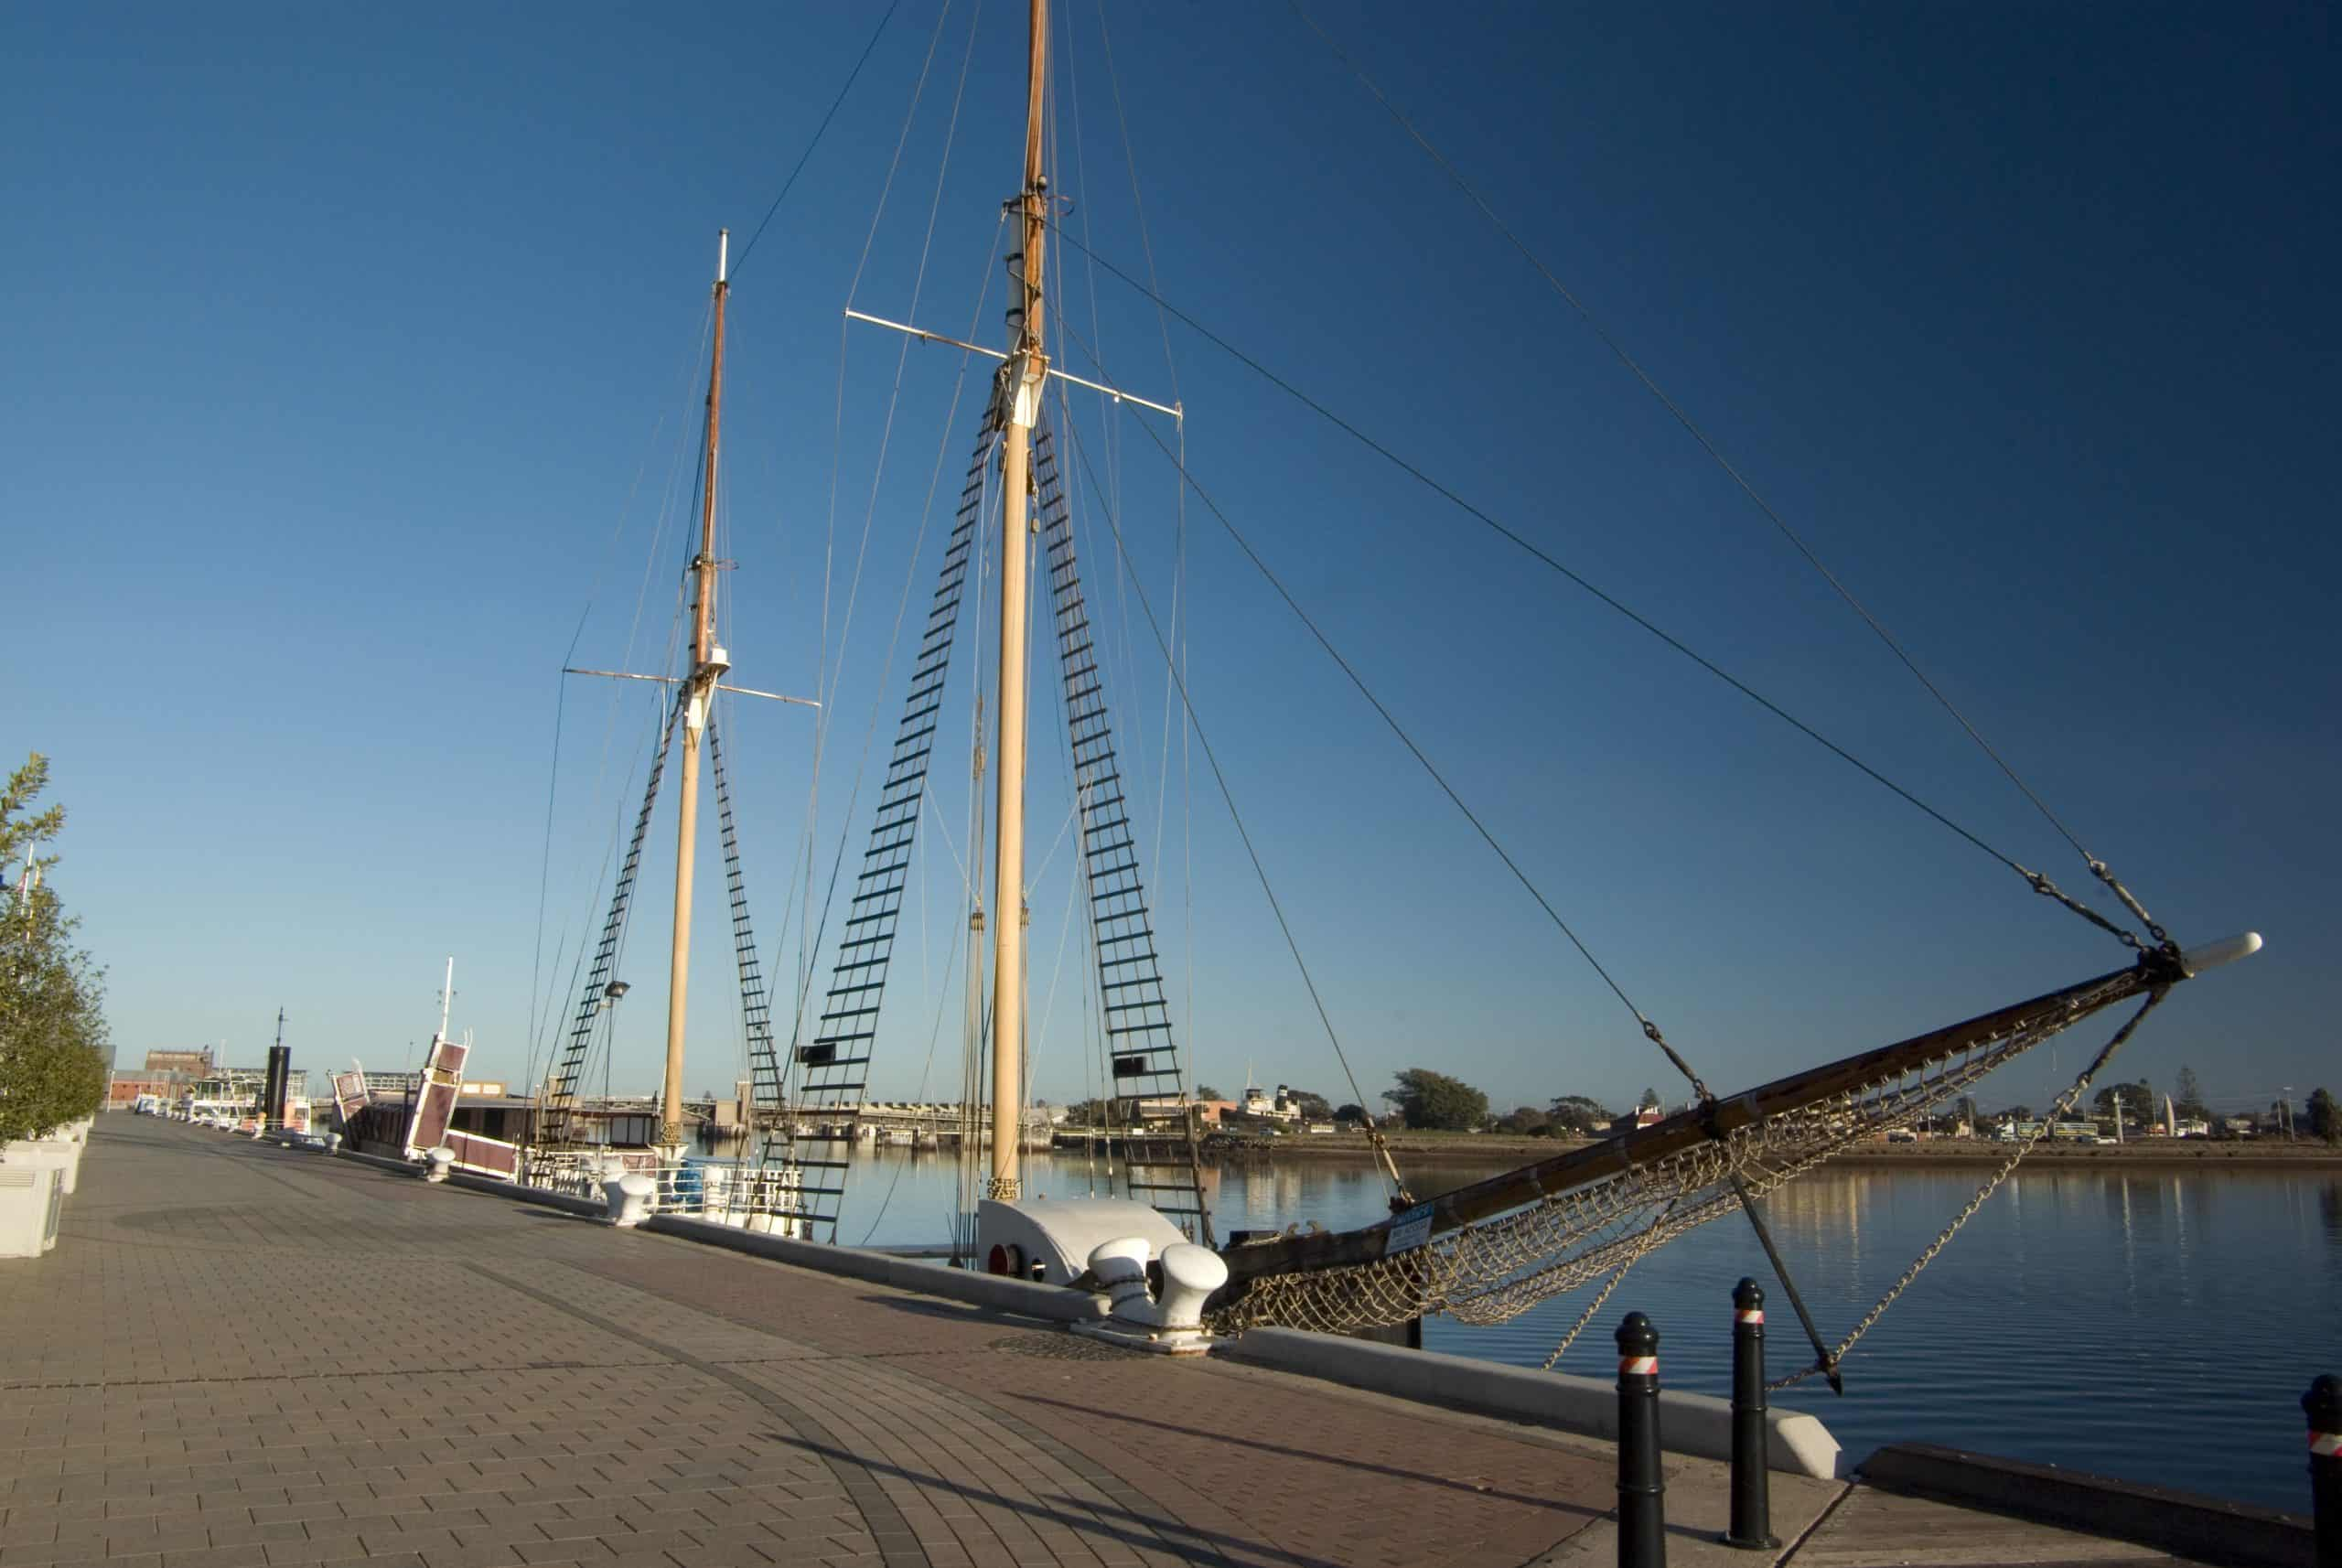 Port Adelaide harbour